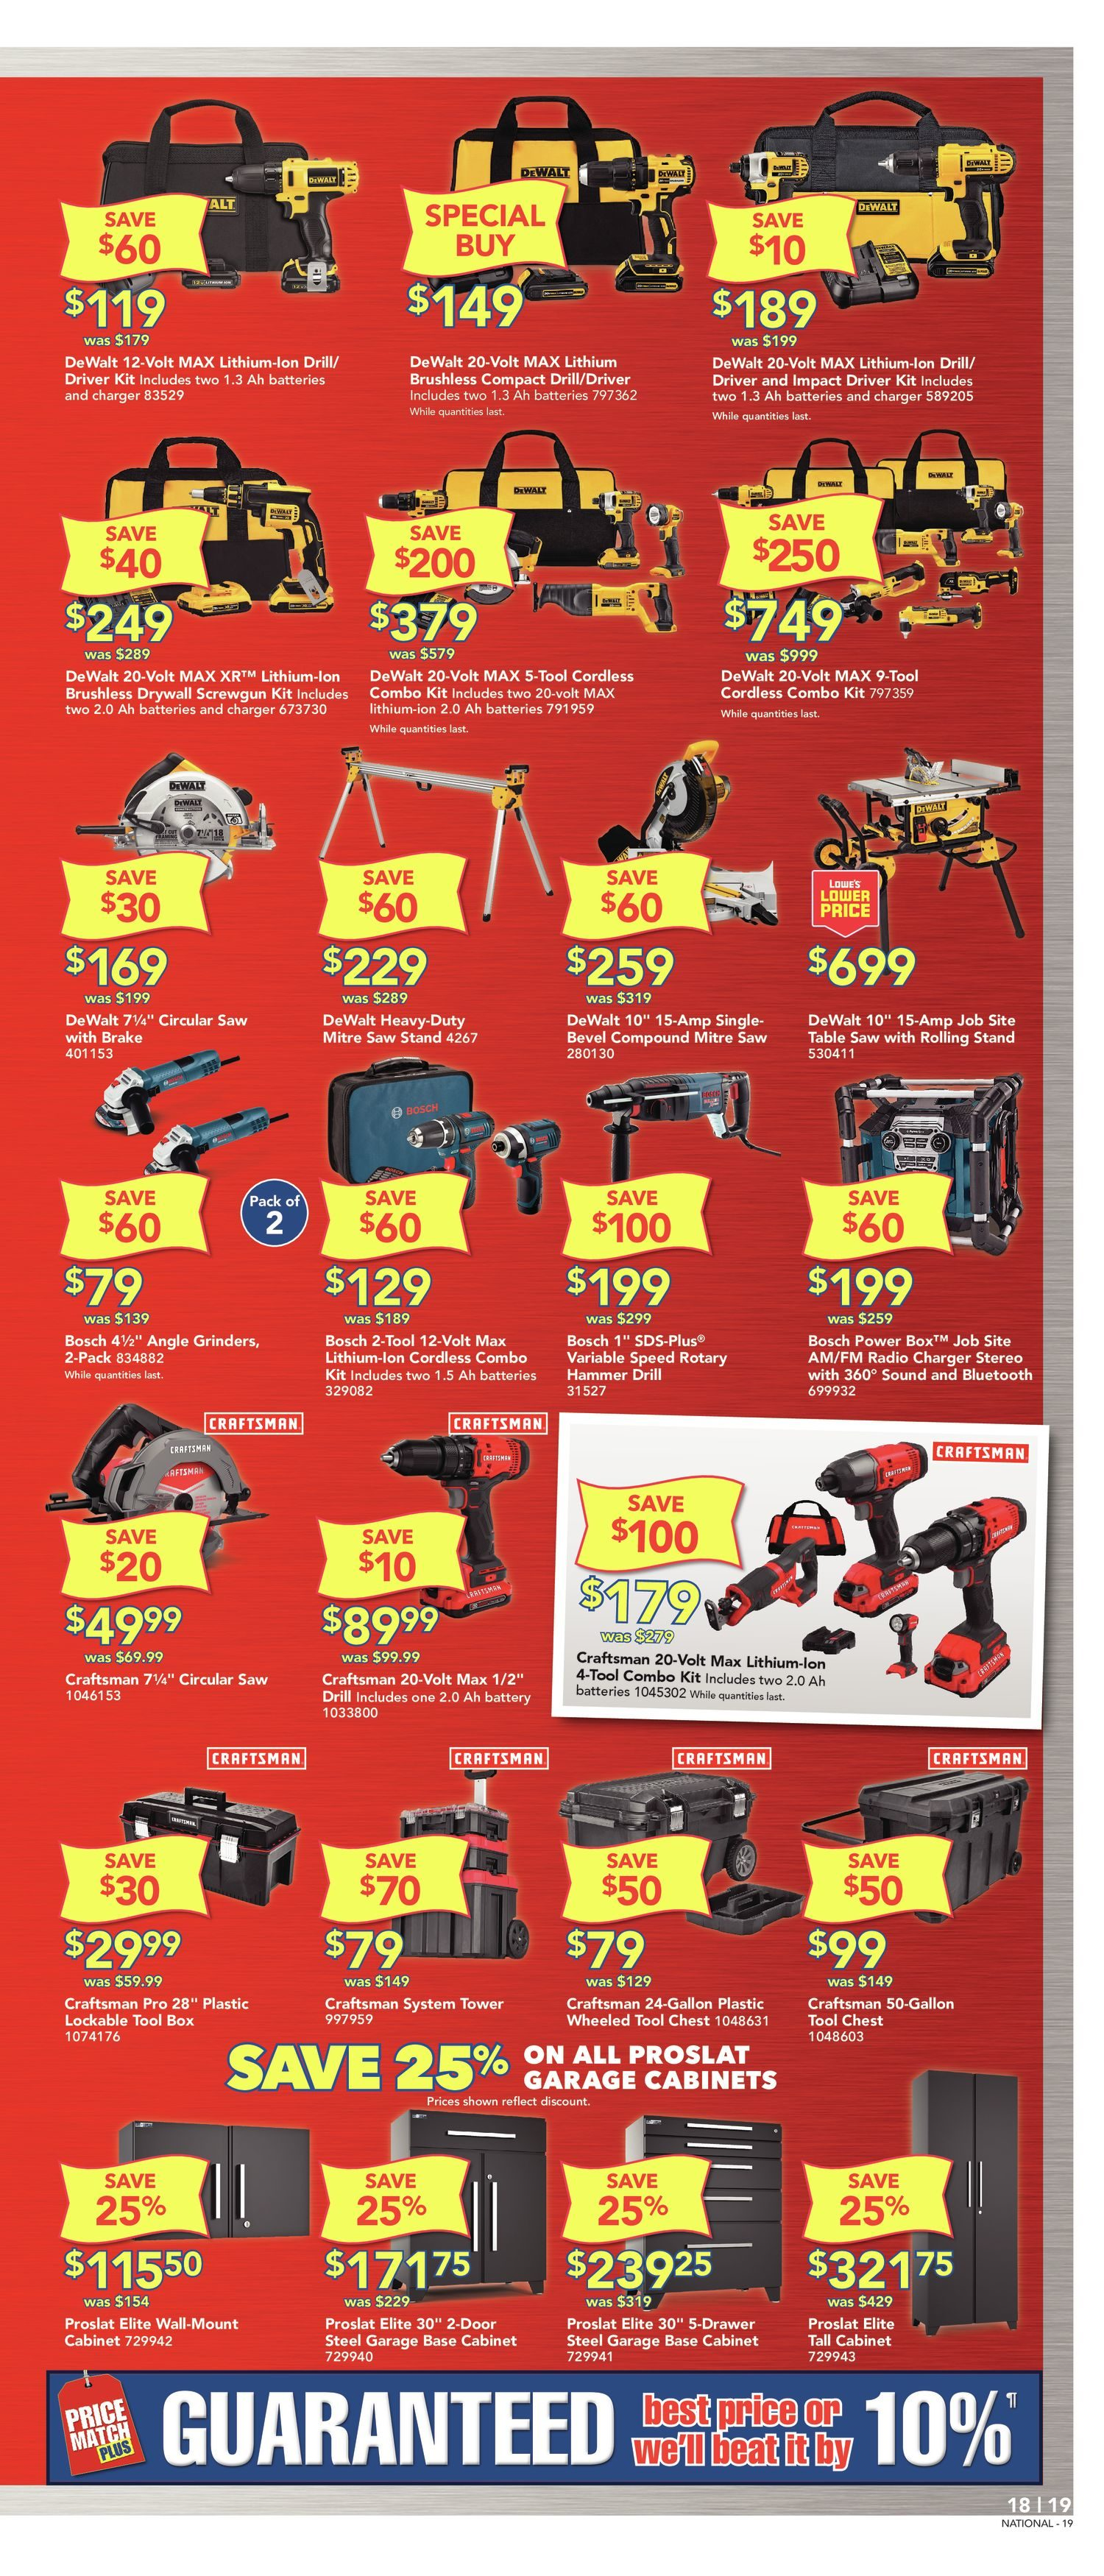 Lowe's Weekly Flyer - Weekly - 12 Year Anniversary Sale